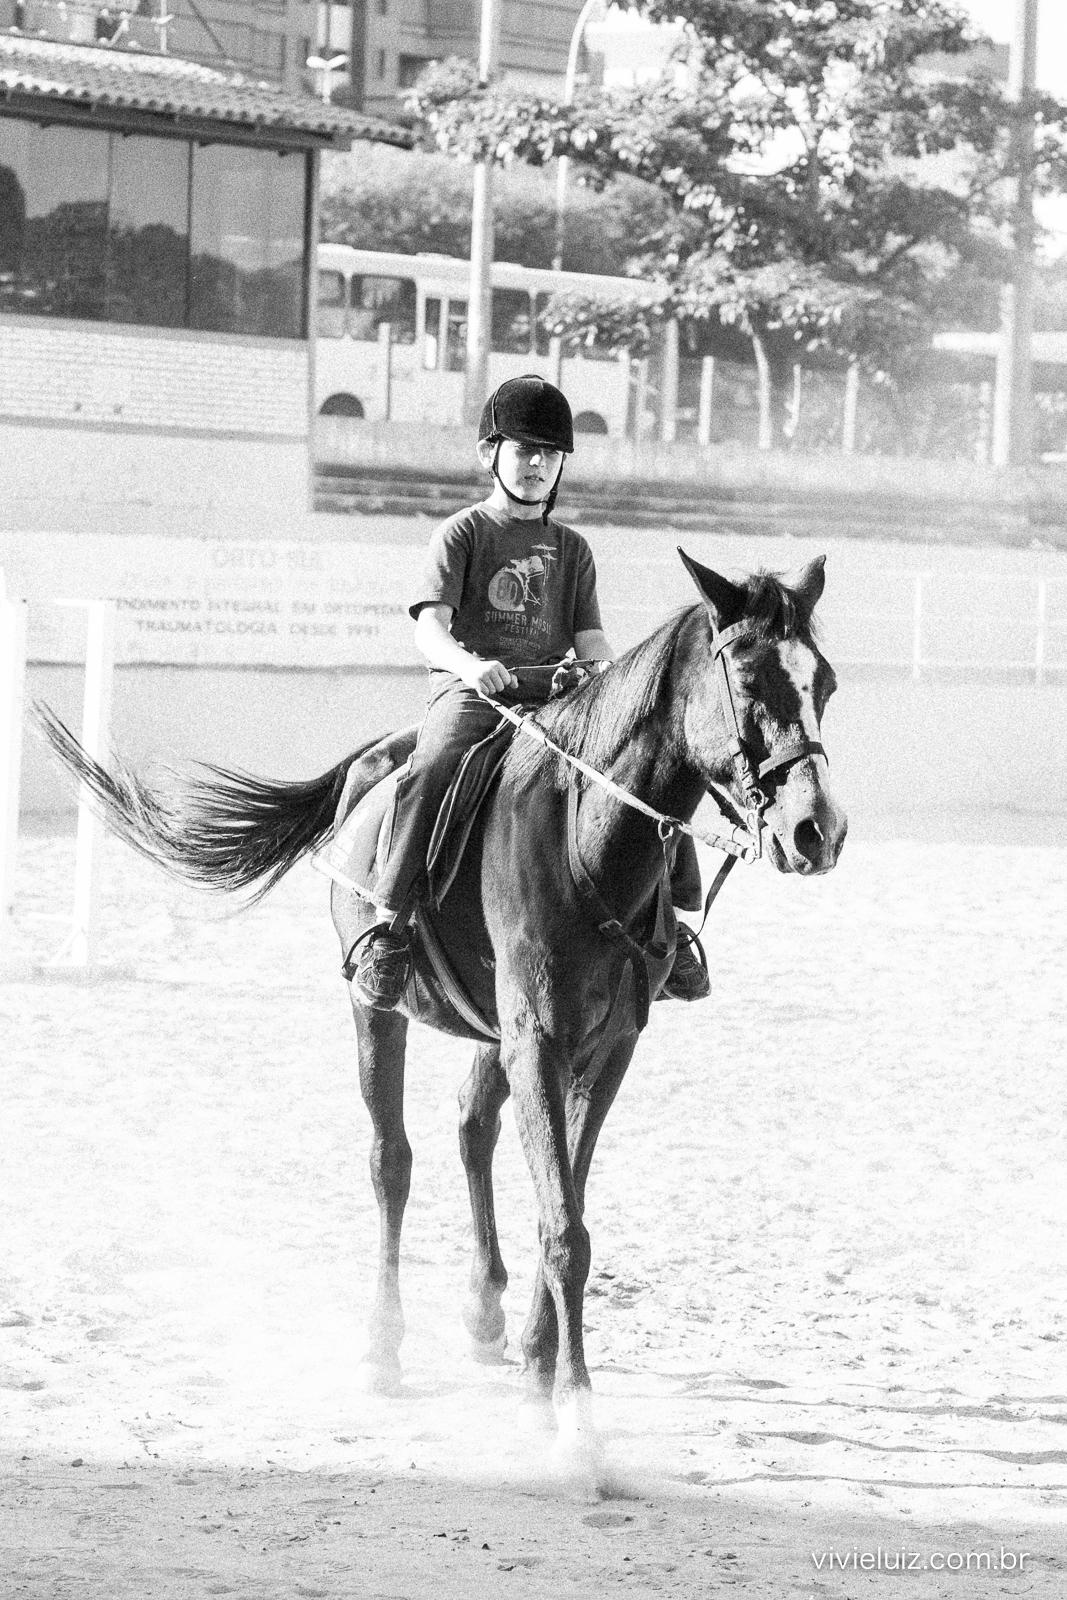 menino andando a cavalo